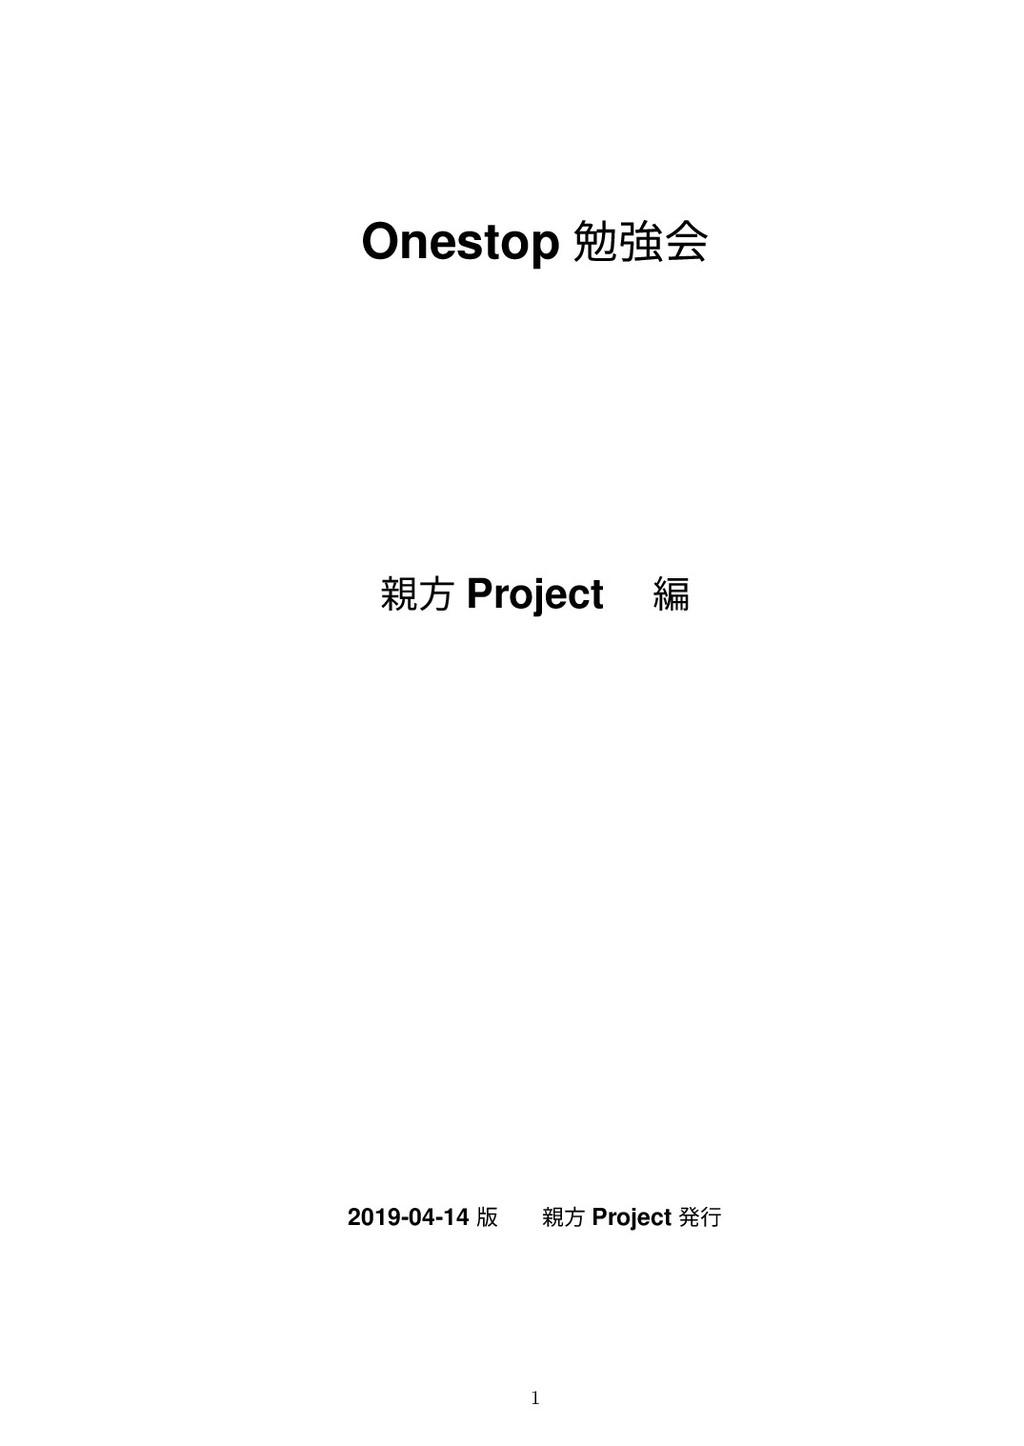 Onestop 勉強会 親⽅ Project 編 2019-04-14 版 親⽅ Proje...